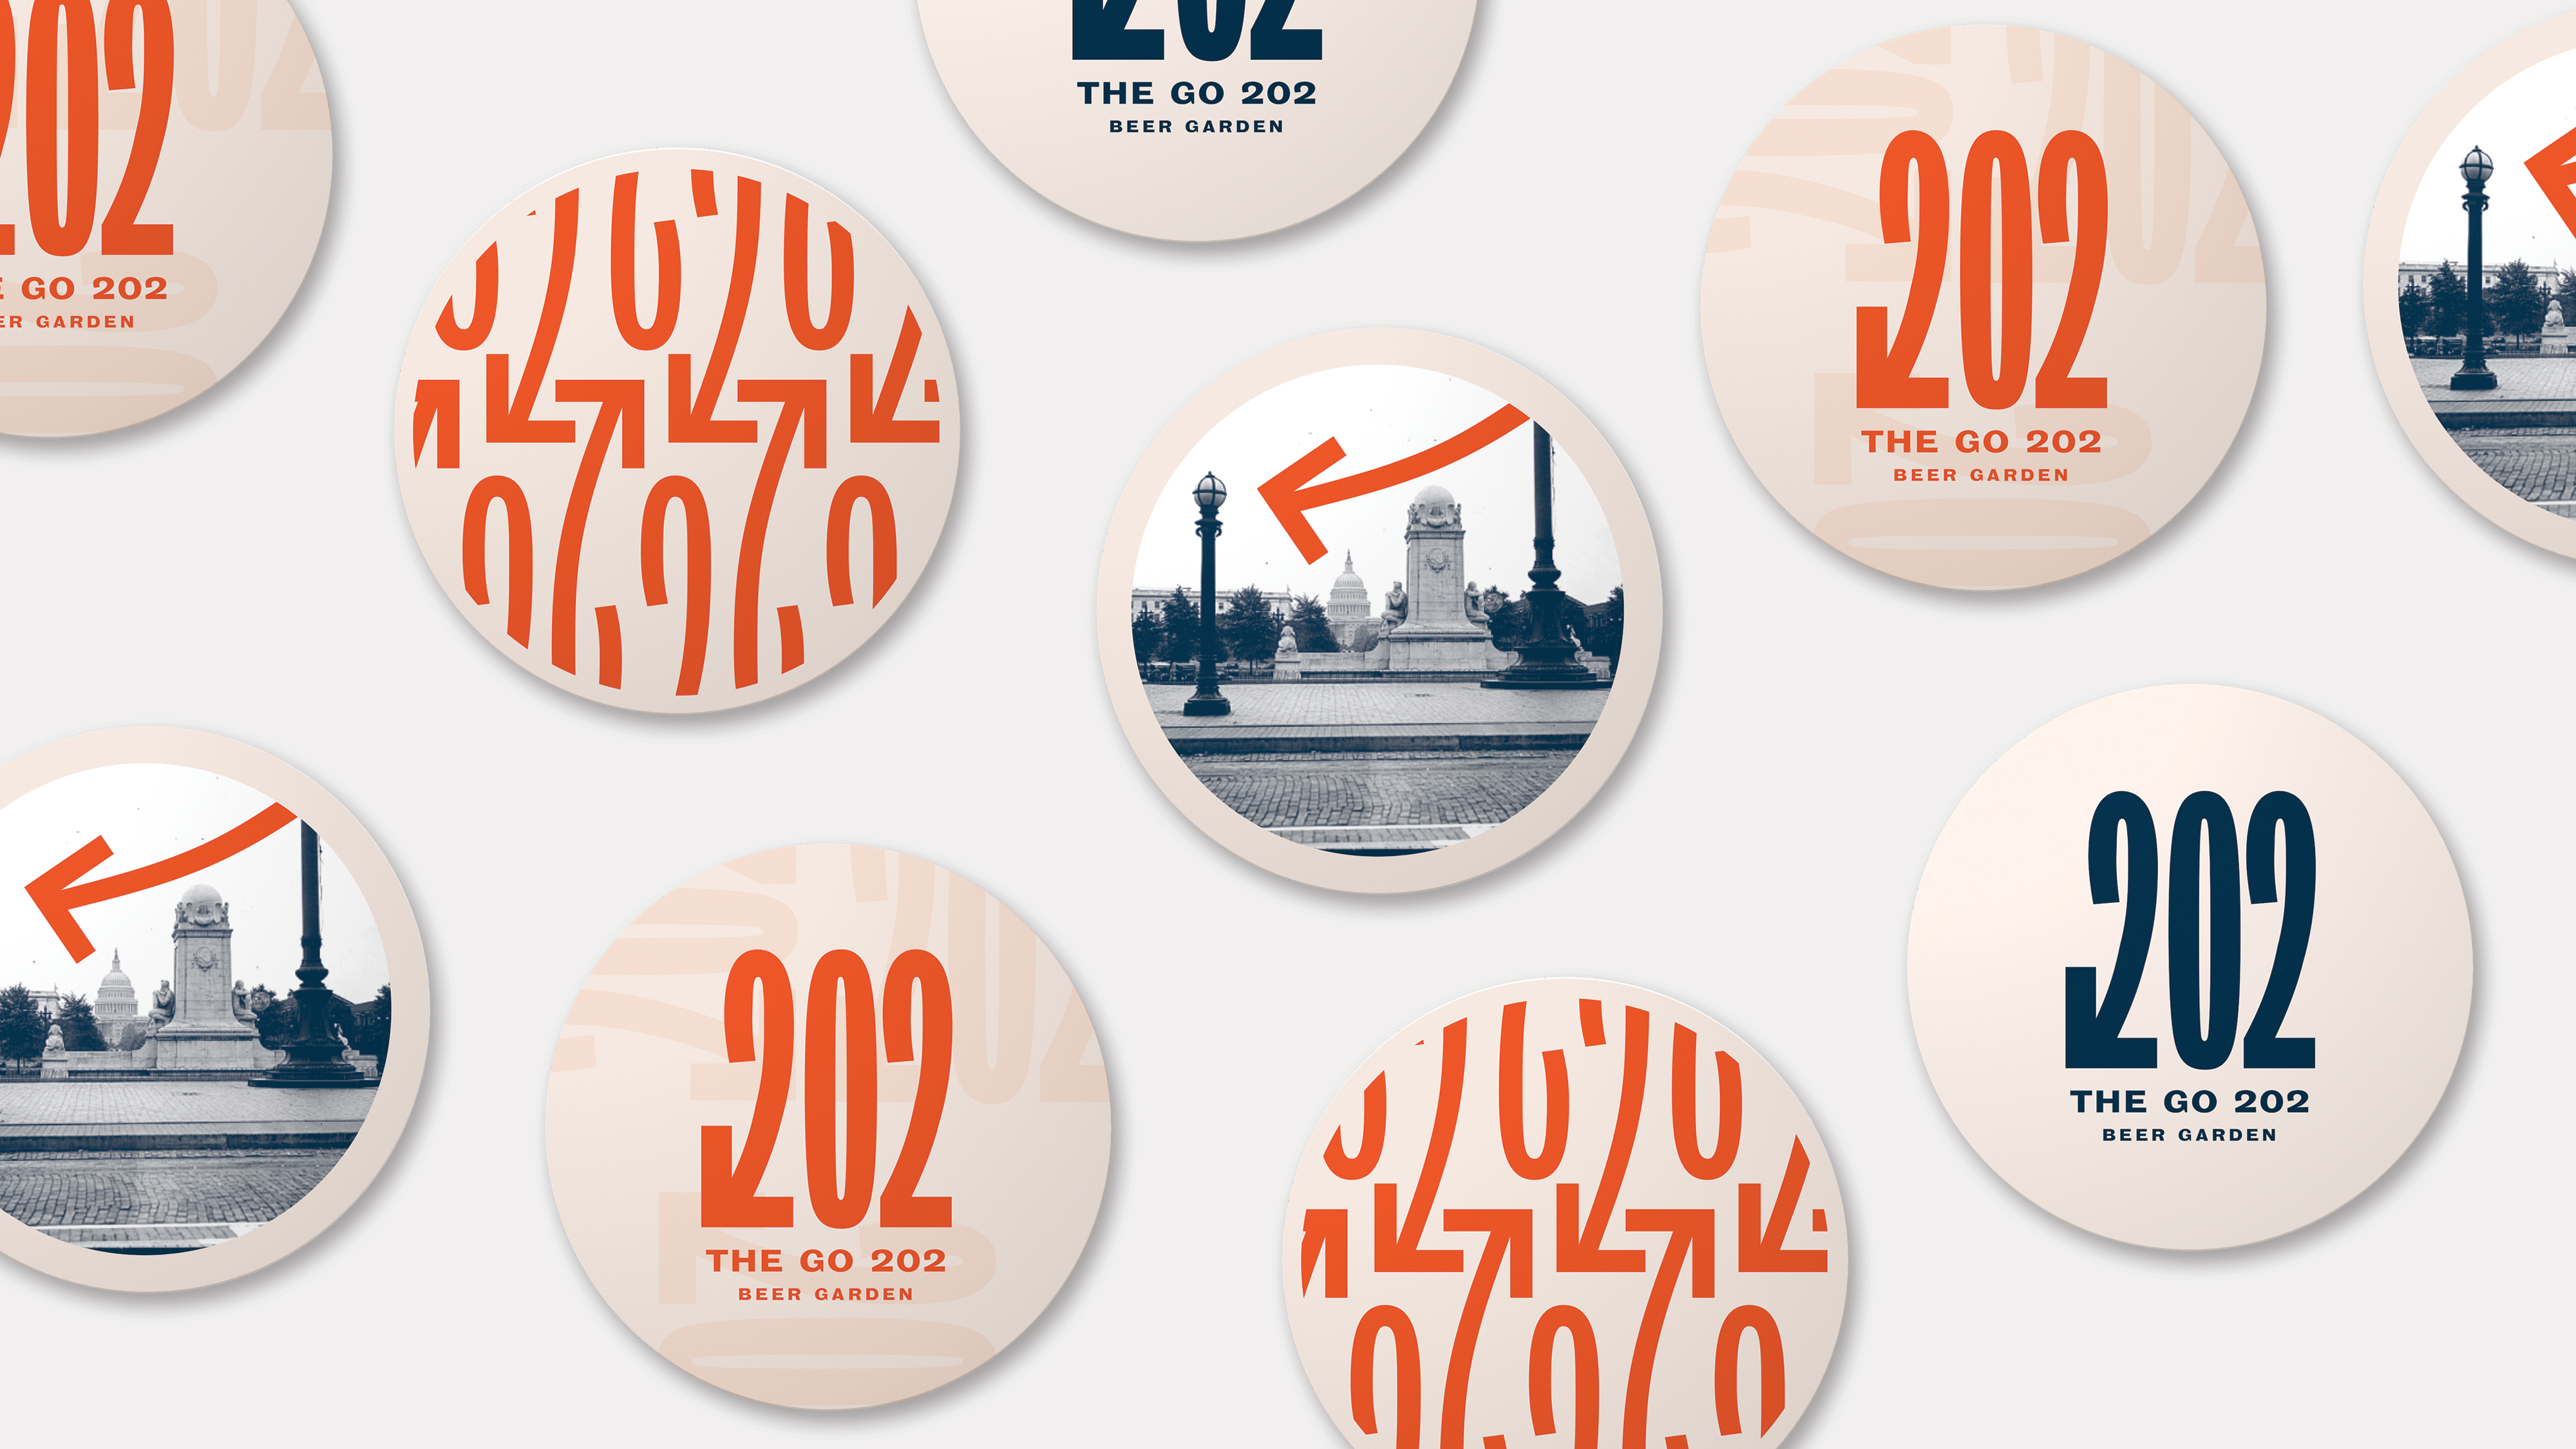 Coaster designs for sercing glasses